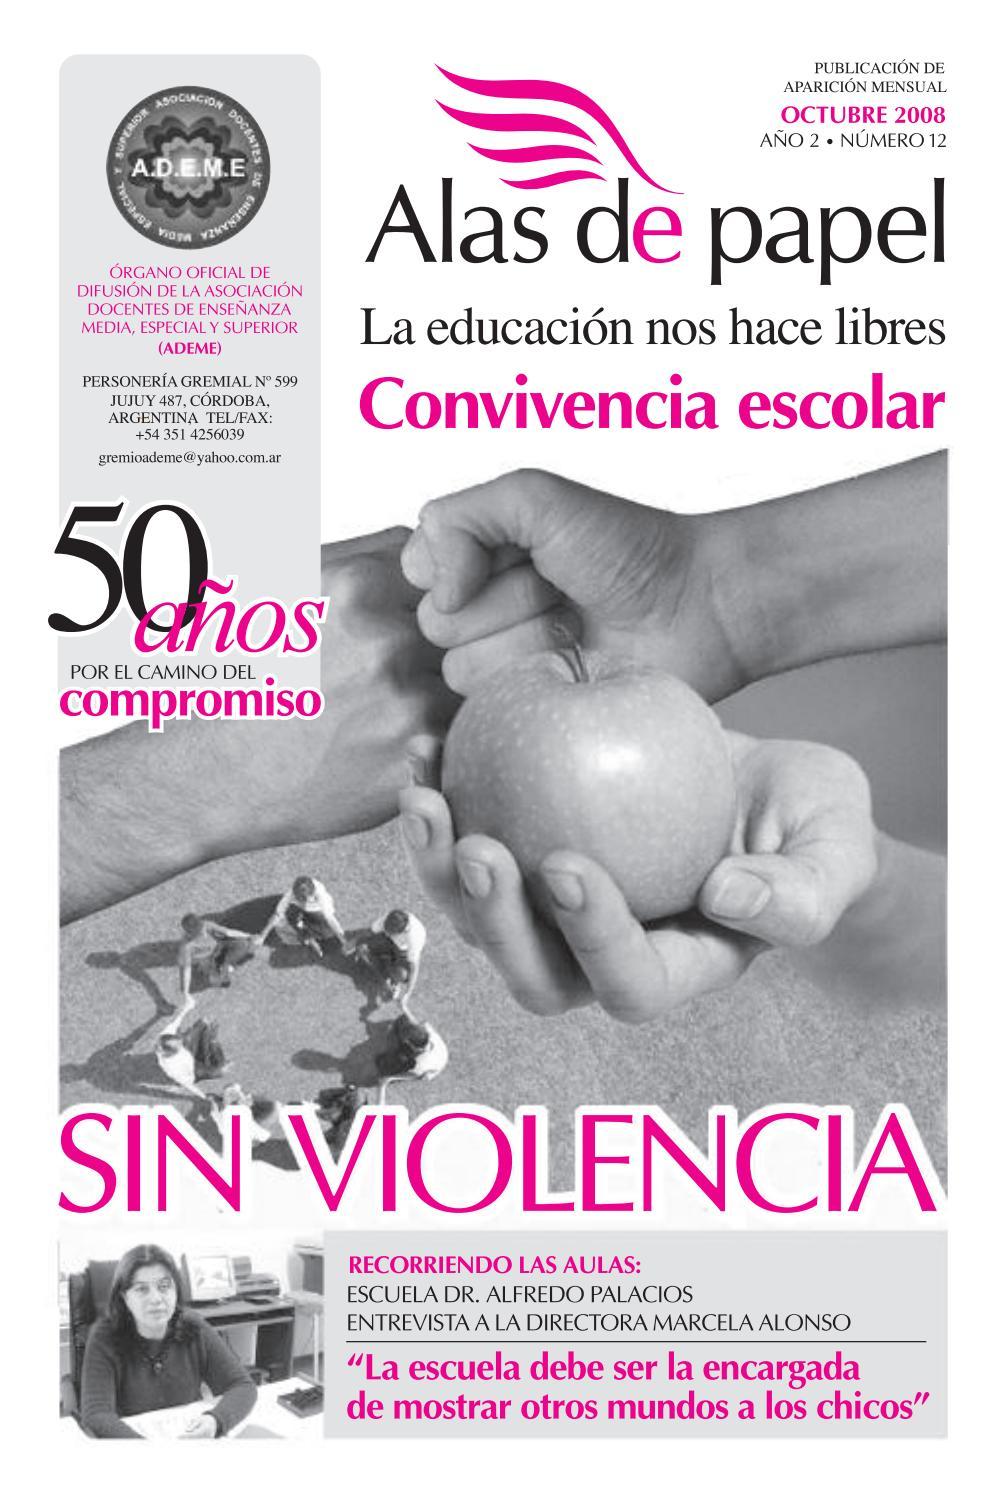 Alas de papel Nº12 by ADEME - issuu